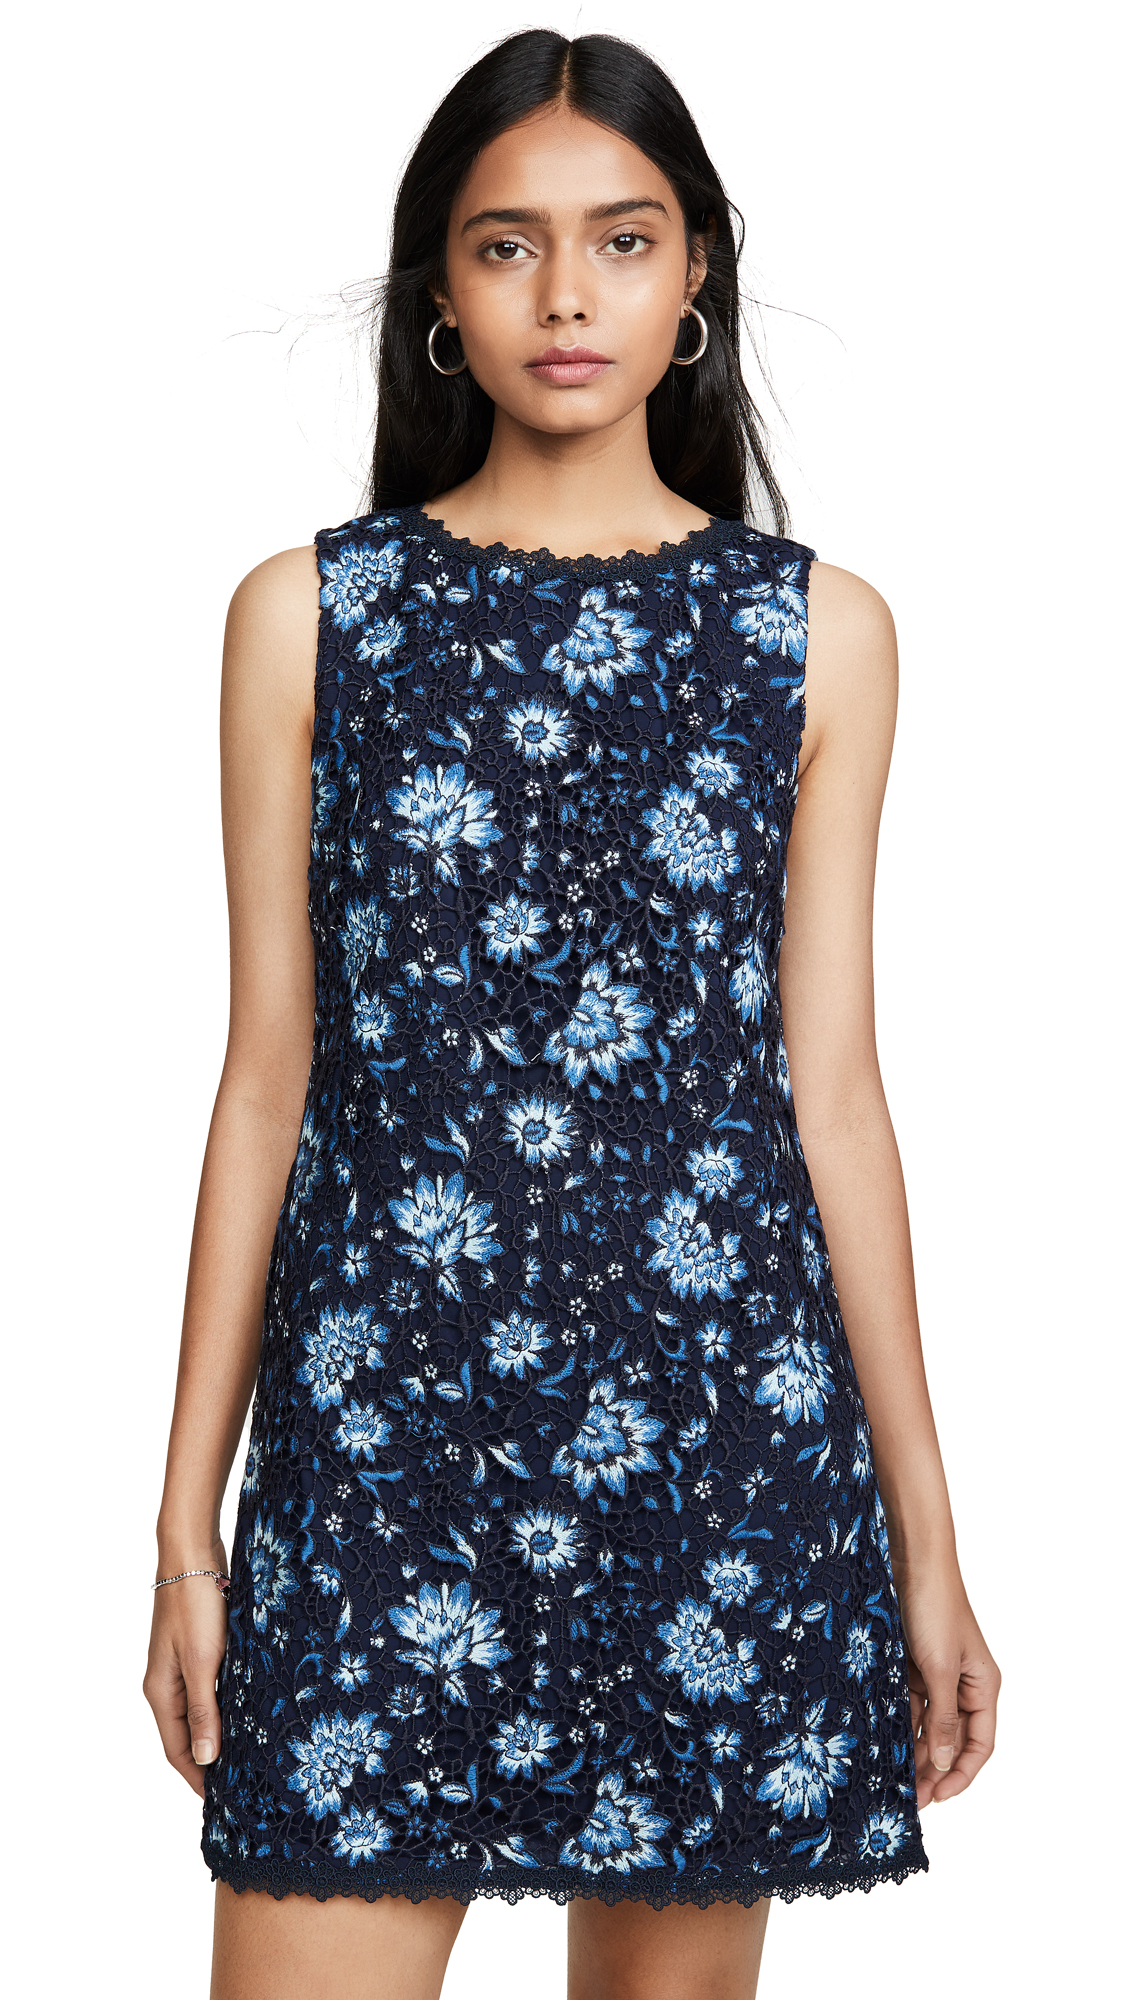 alice + olivia Clyde Shift Dress - Cornflower/Multi